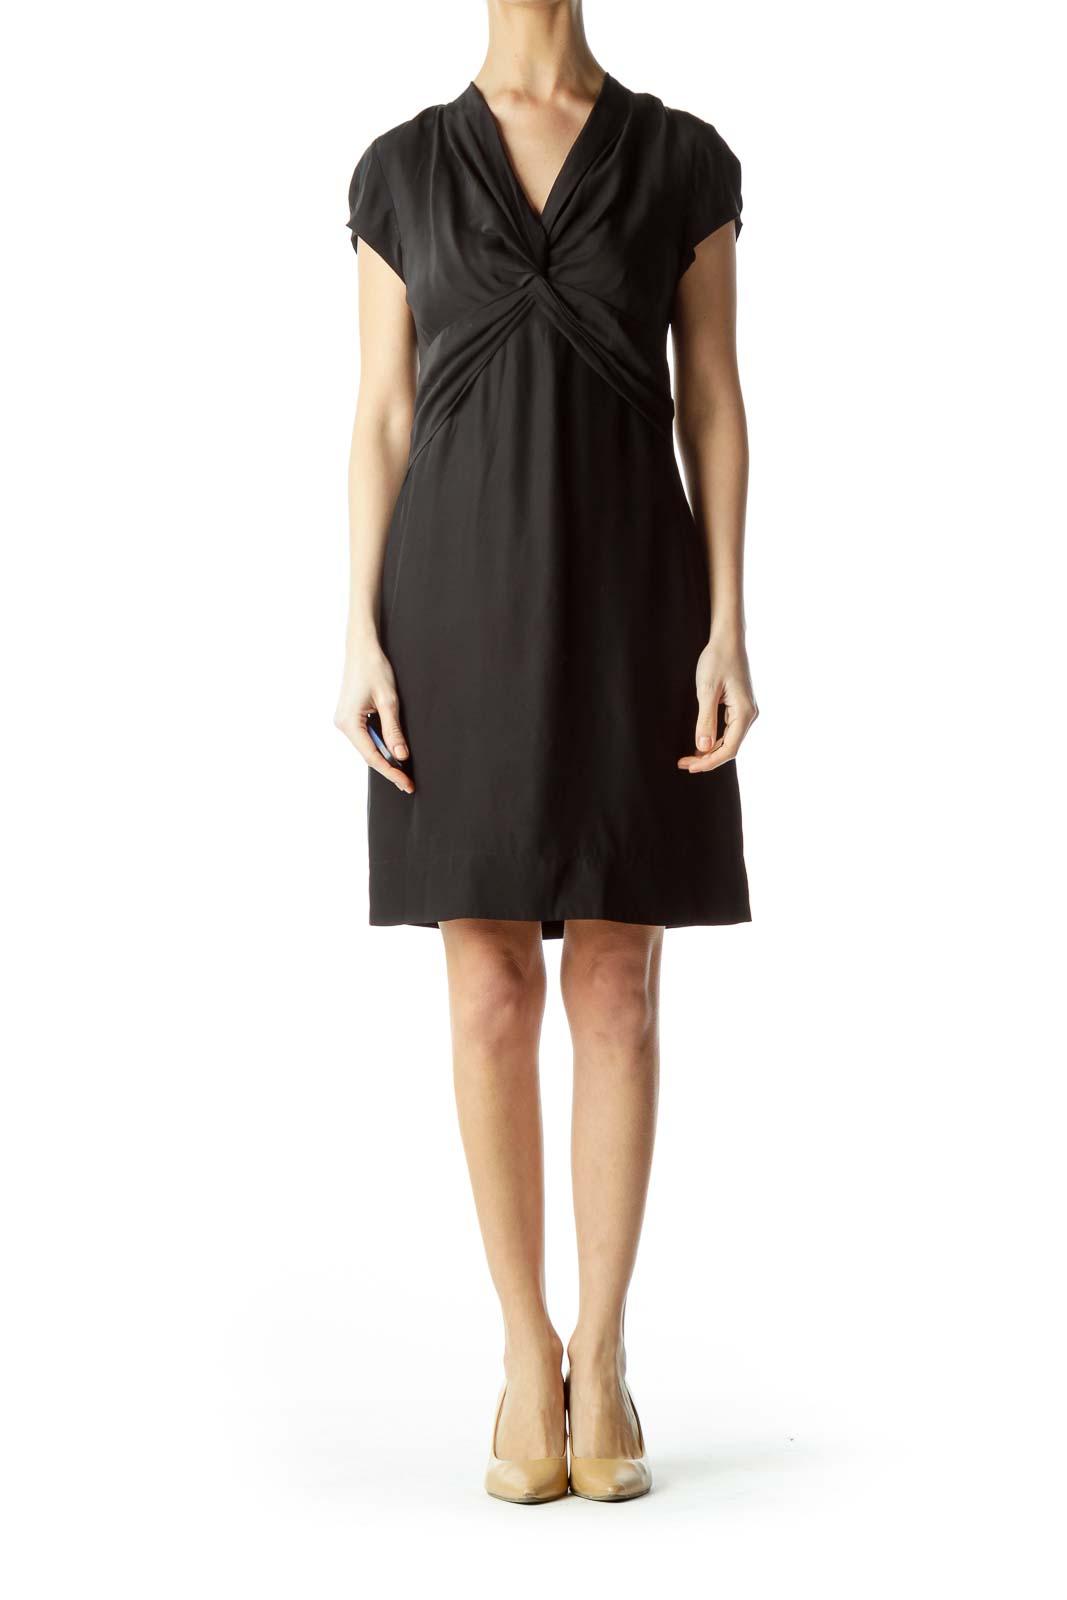 Black Knot Front Short Sleeve Dress